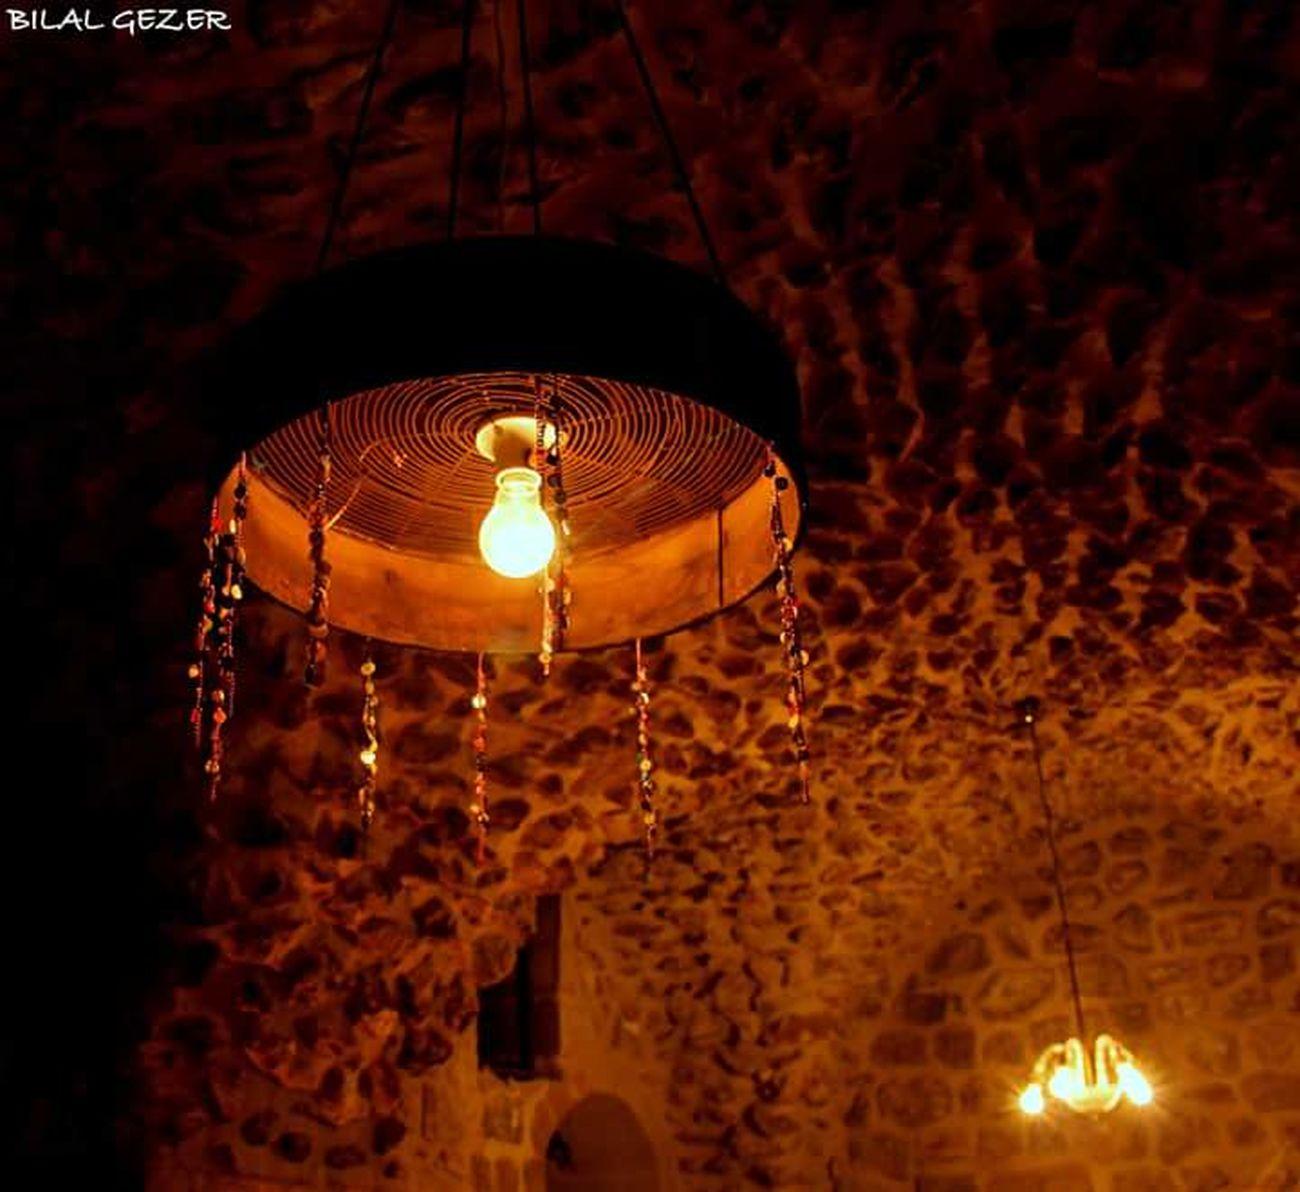 Illuminated Lighting Equipment Hanging No People Indoors  Night Architecture